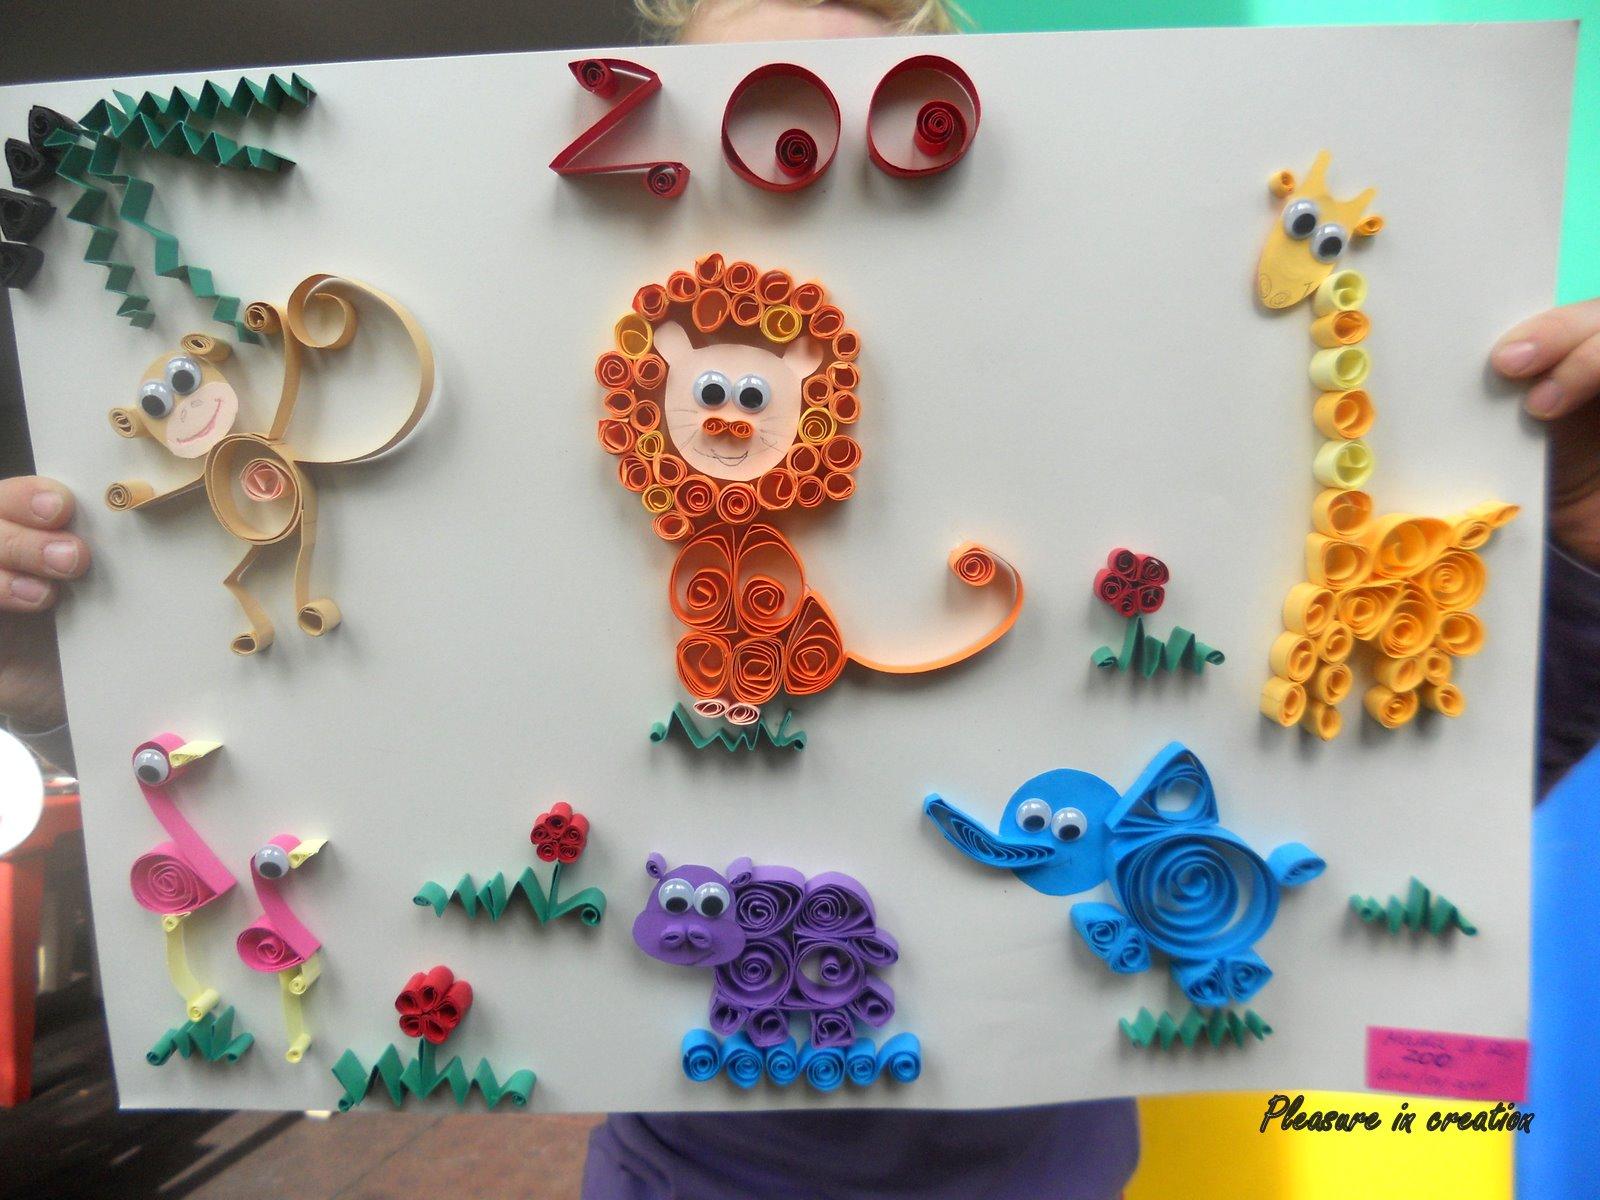 Essay on the tree zoo animals